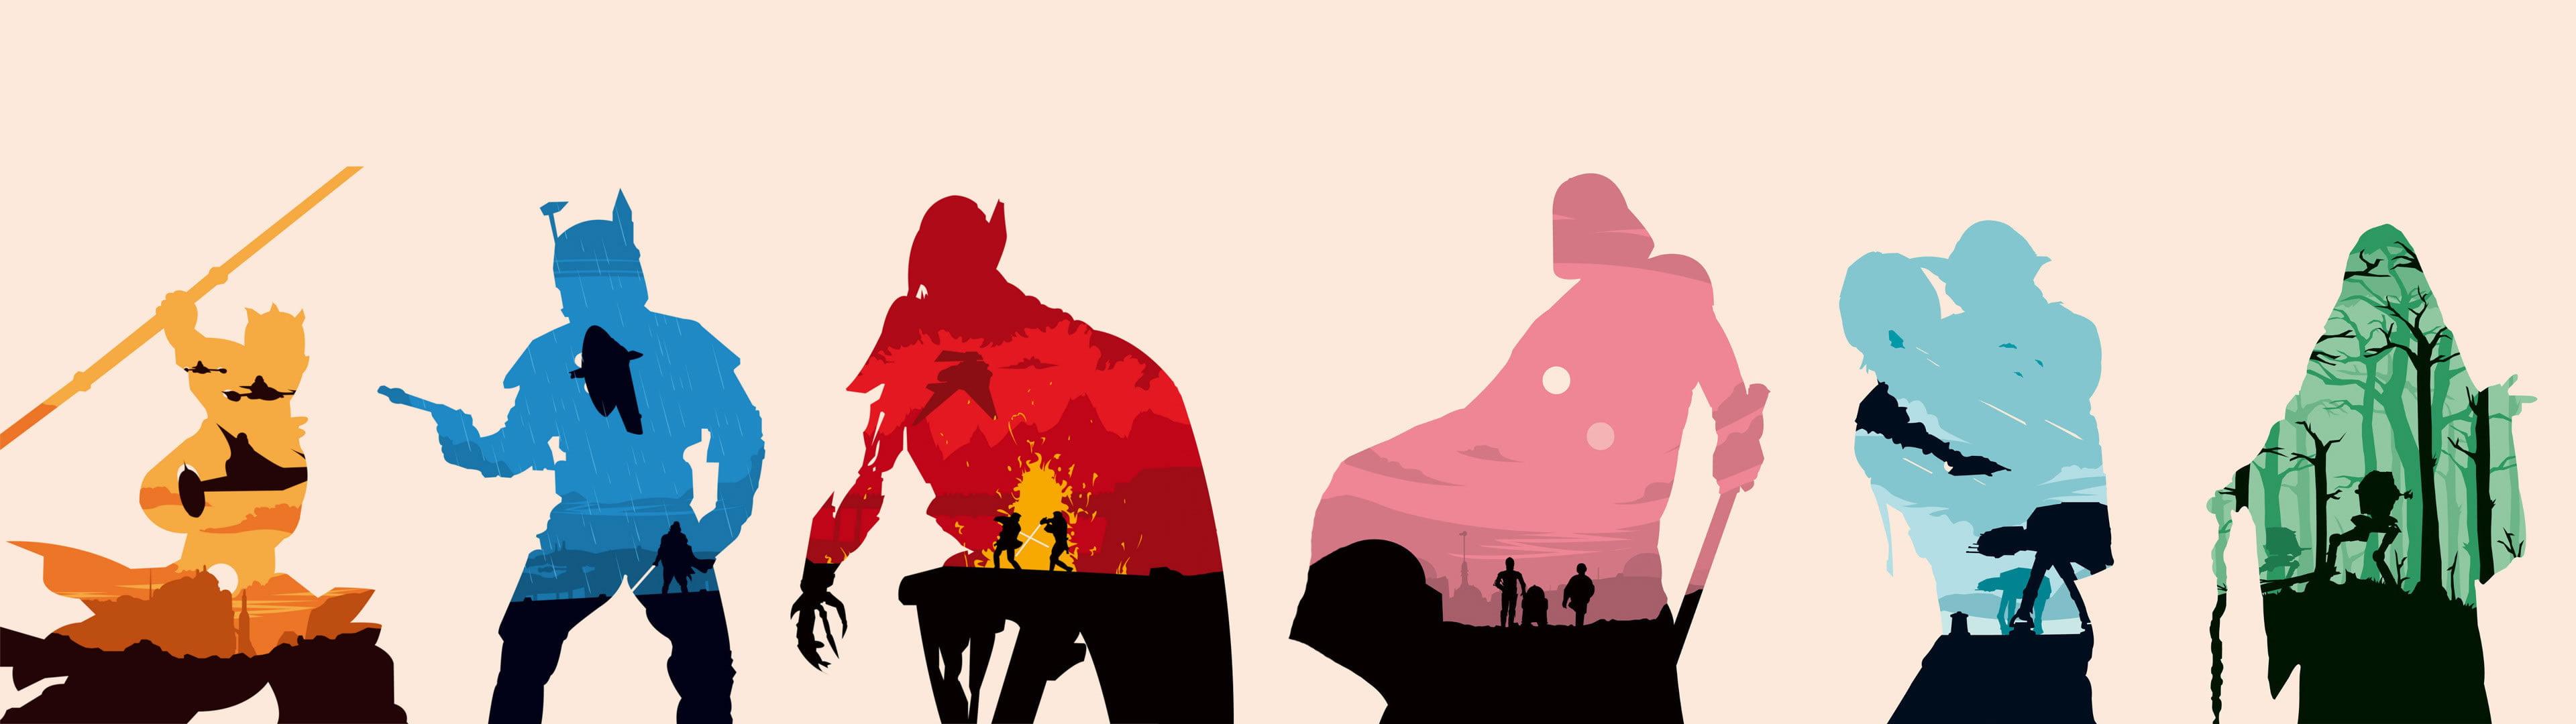 besplatne pozadine za dva monitora star wars silhouettes